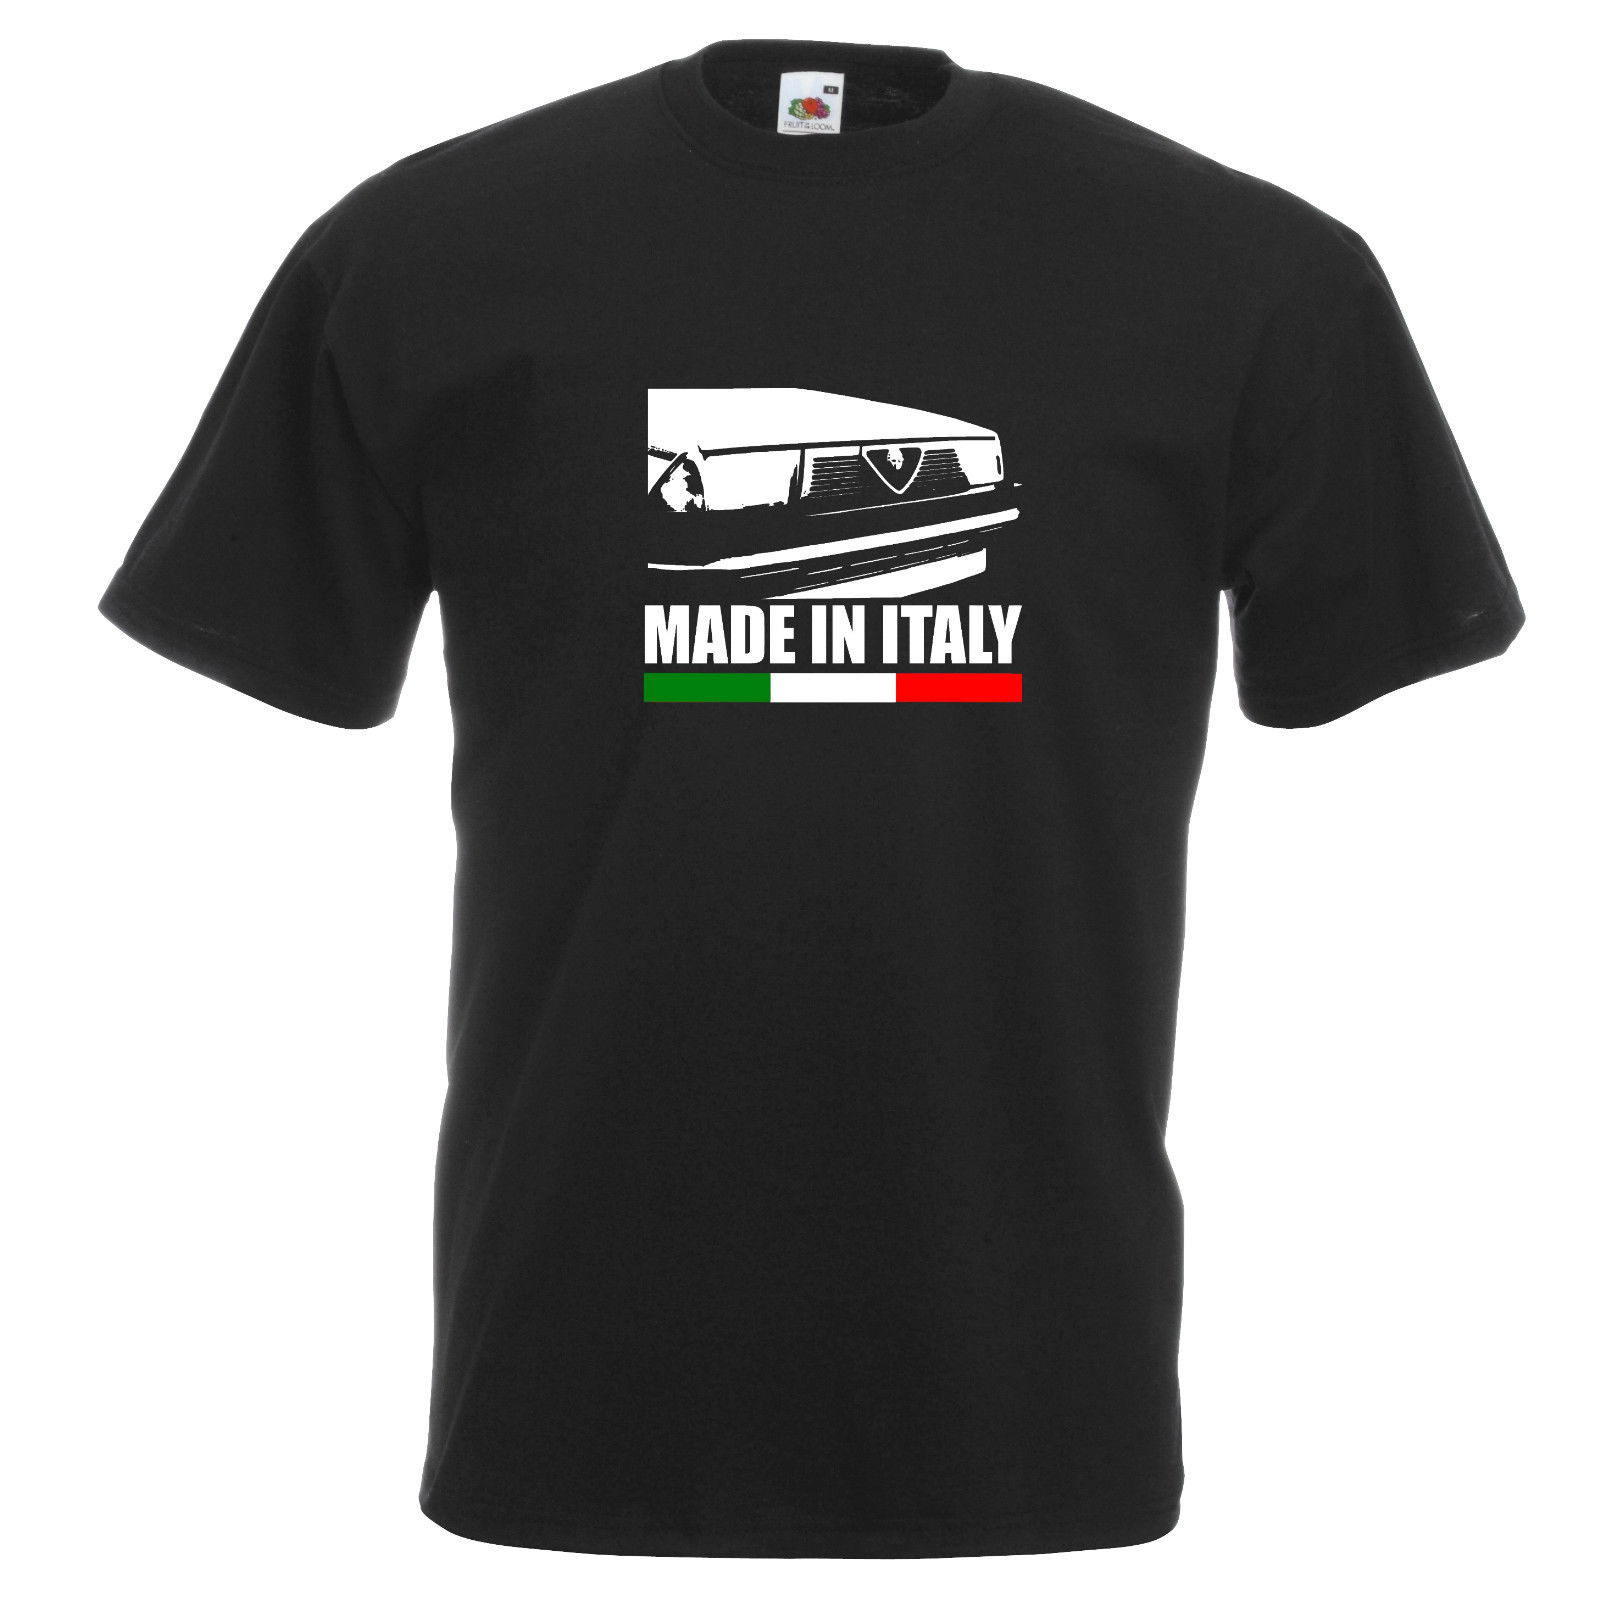 2018 Summer New Cool Tee Shirt Italy Car Romeo 75 Retro Car Motoring  Inspired T Shirt Tee T-shirt Dad Gift Cotton T-shirt